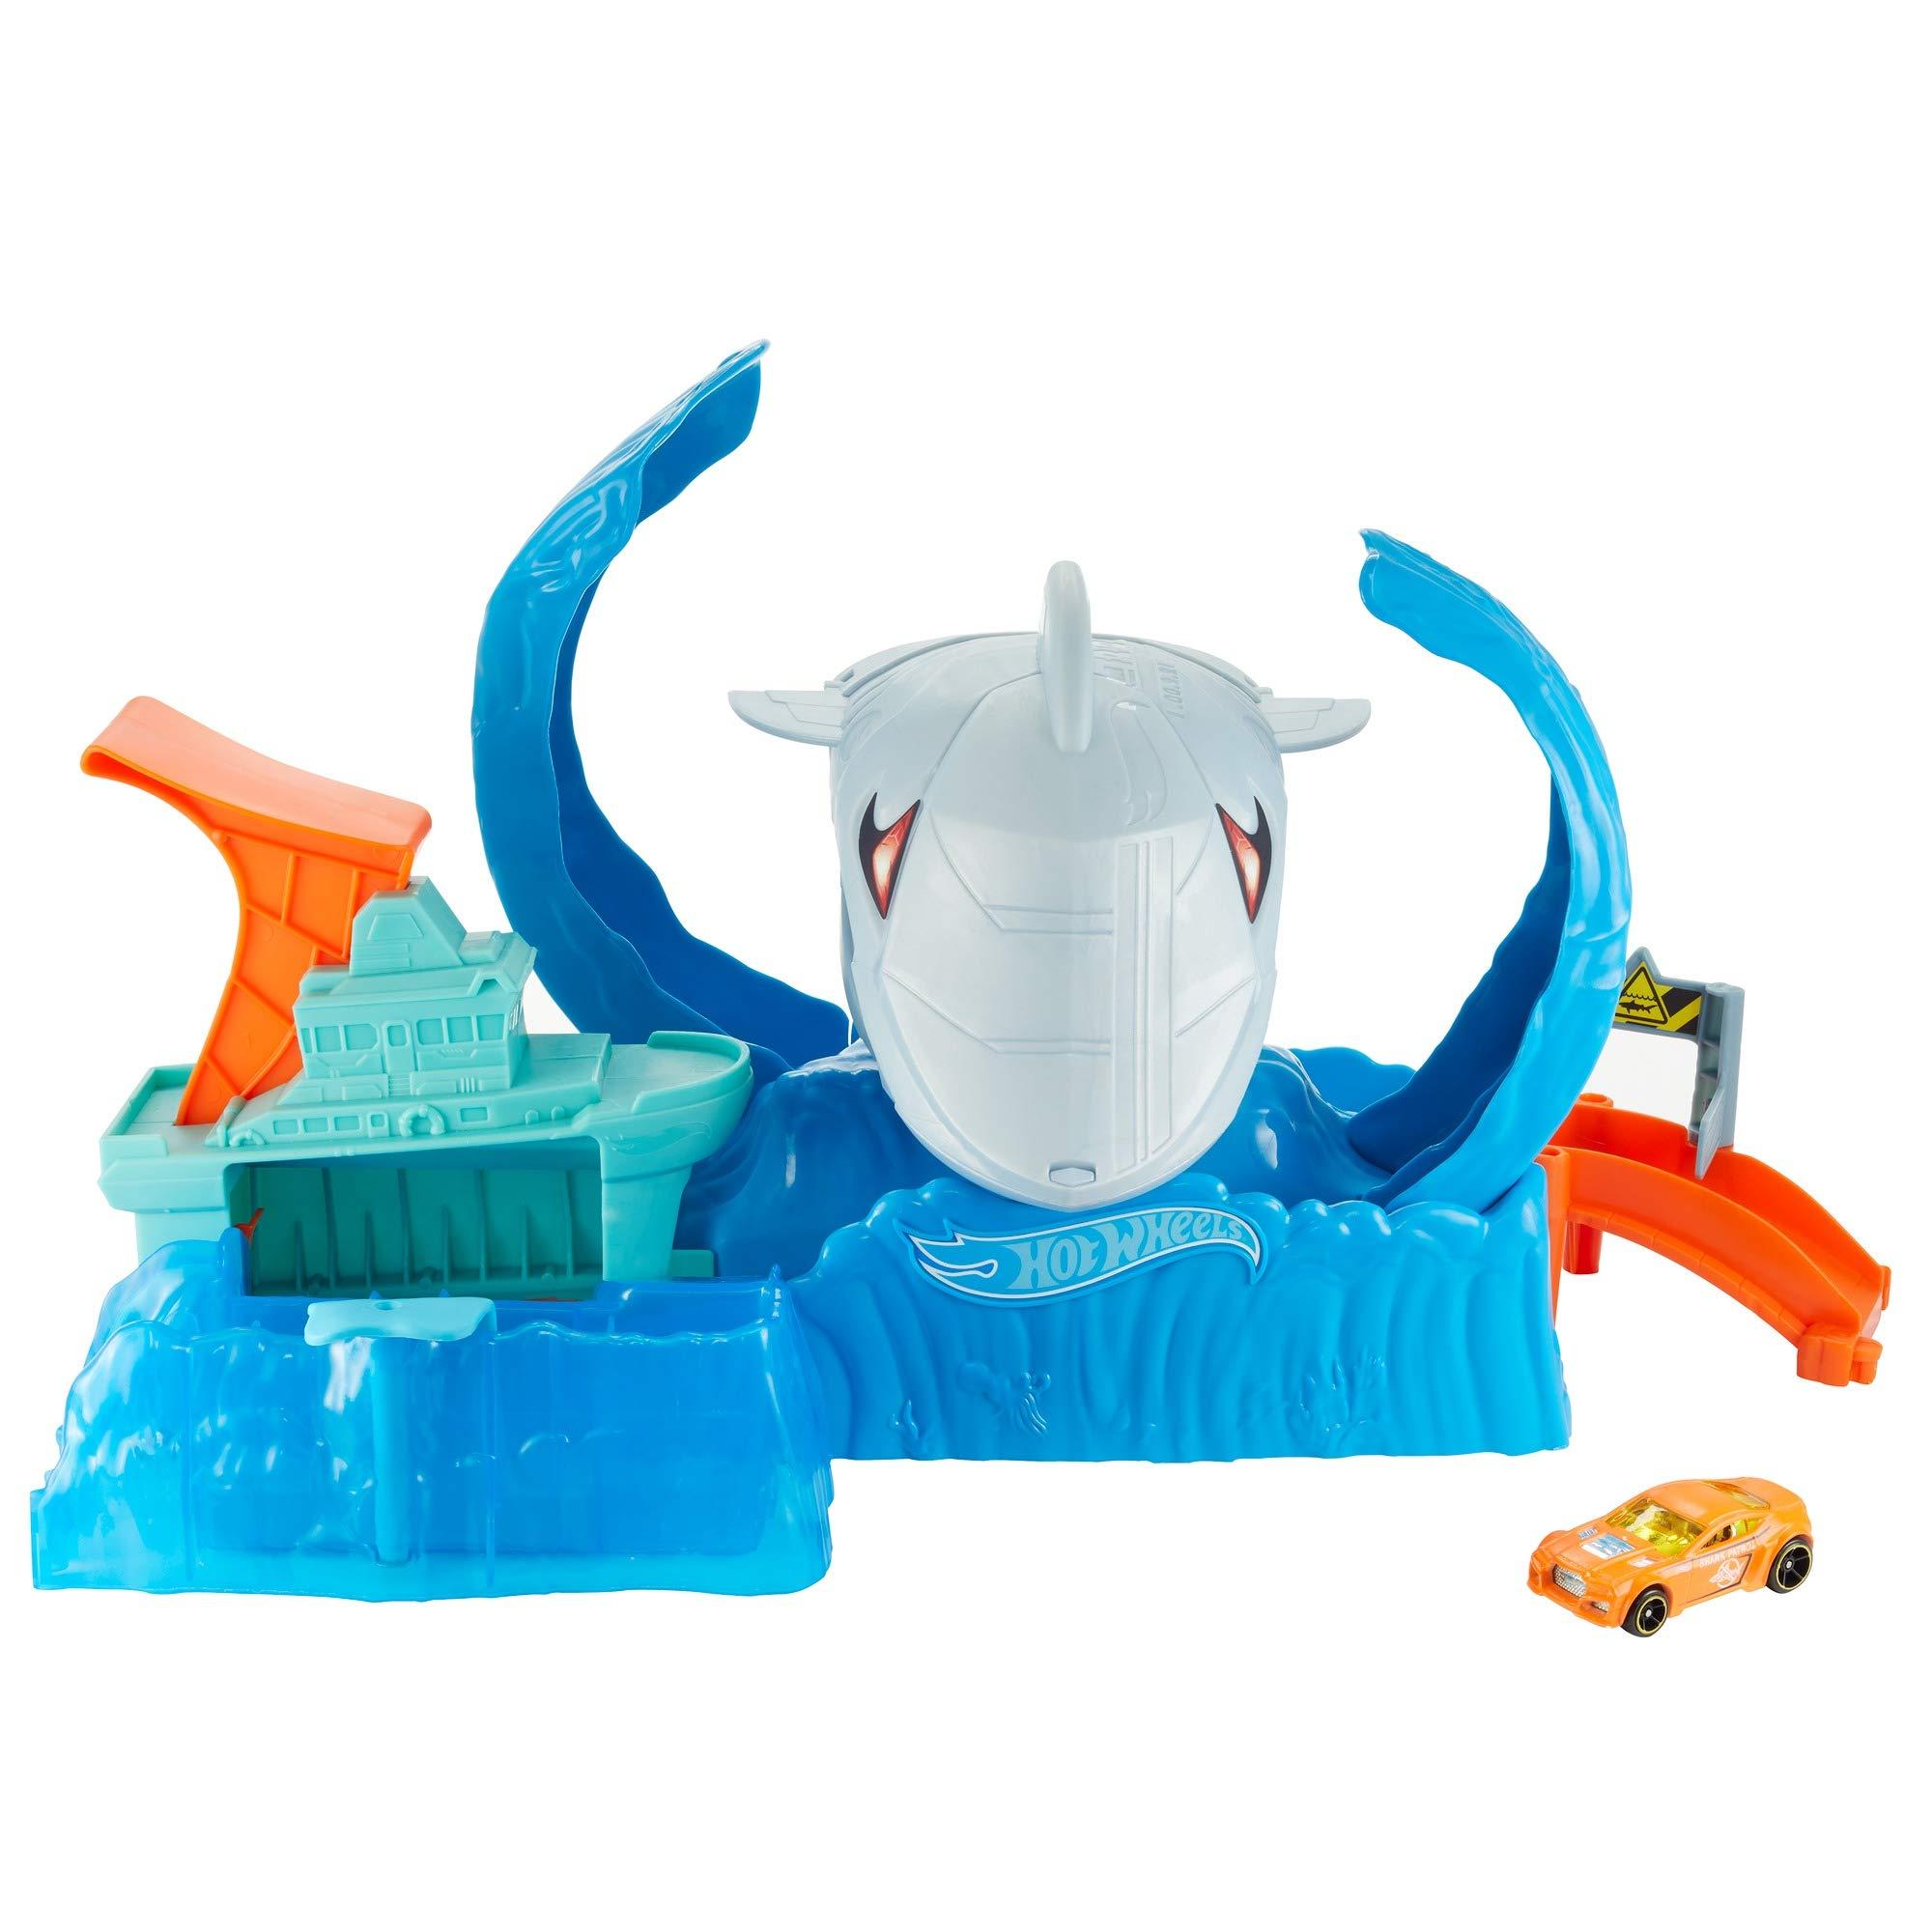 Pista ( Play Set ): Robo Shark Frenzy - Hot Wheels